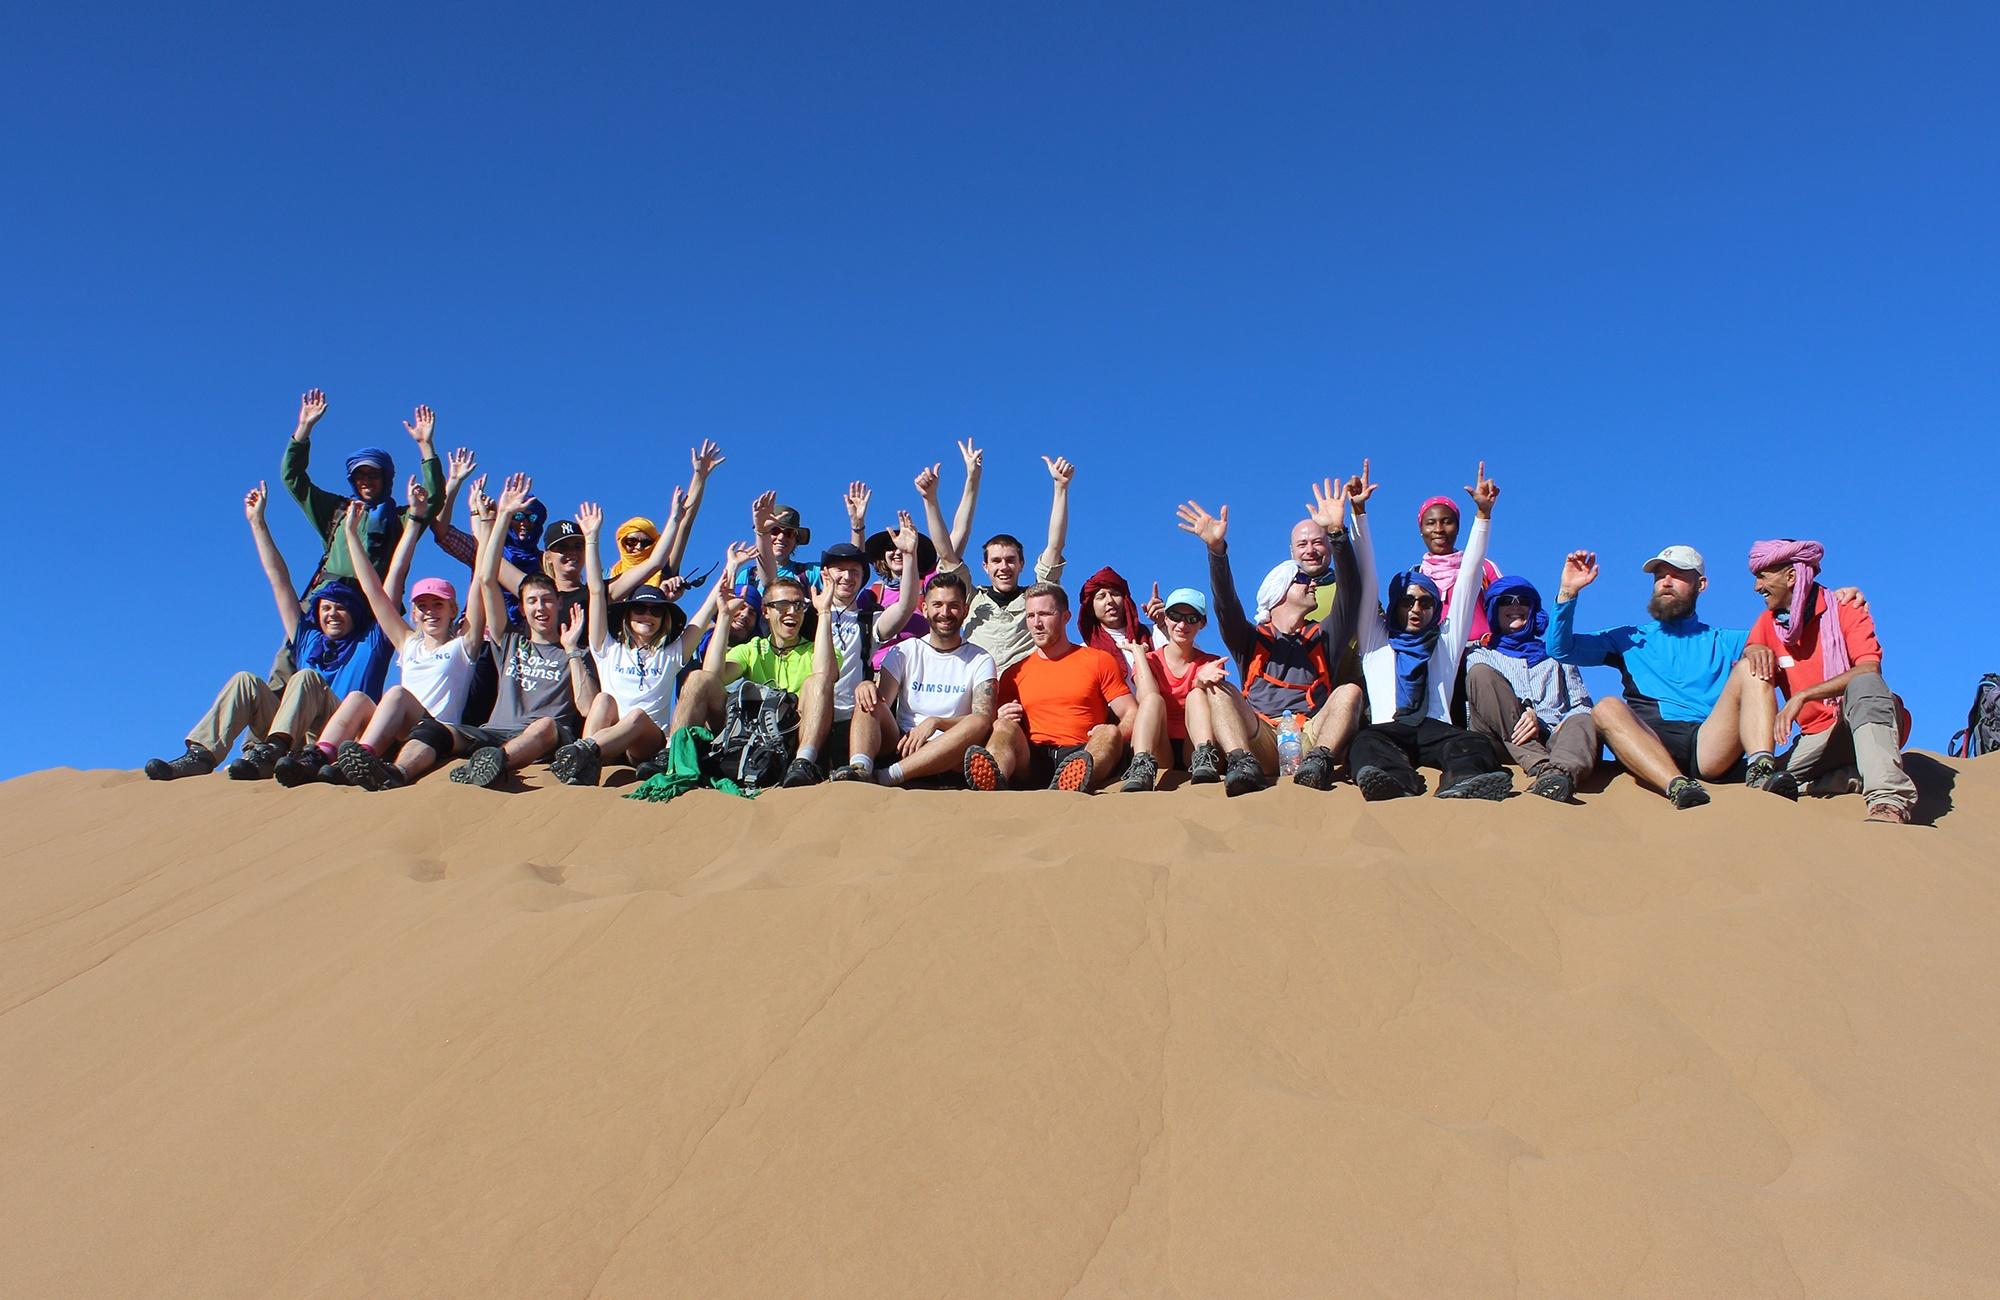 Discover_Adventure_challenge_group_celebrating_in_Sahara.jpg